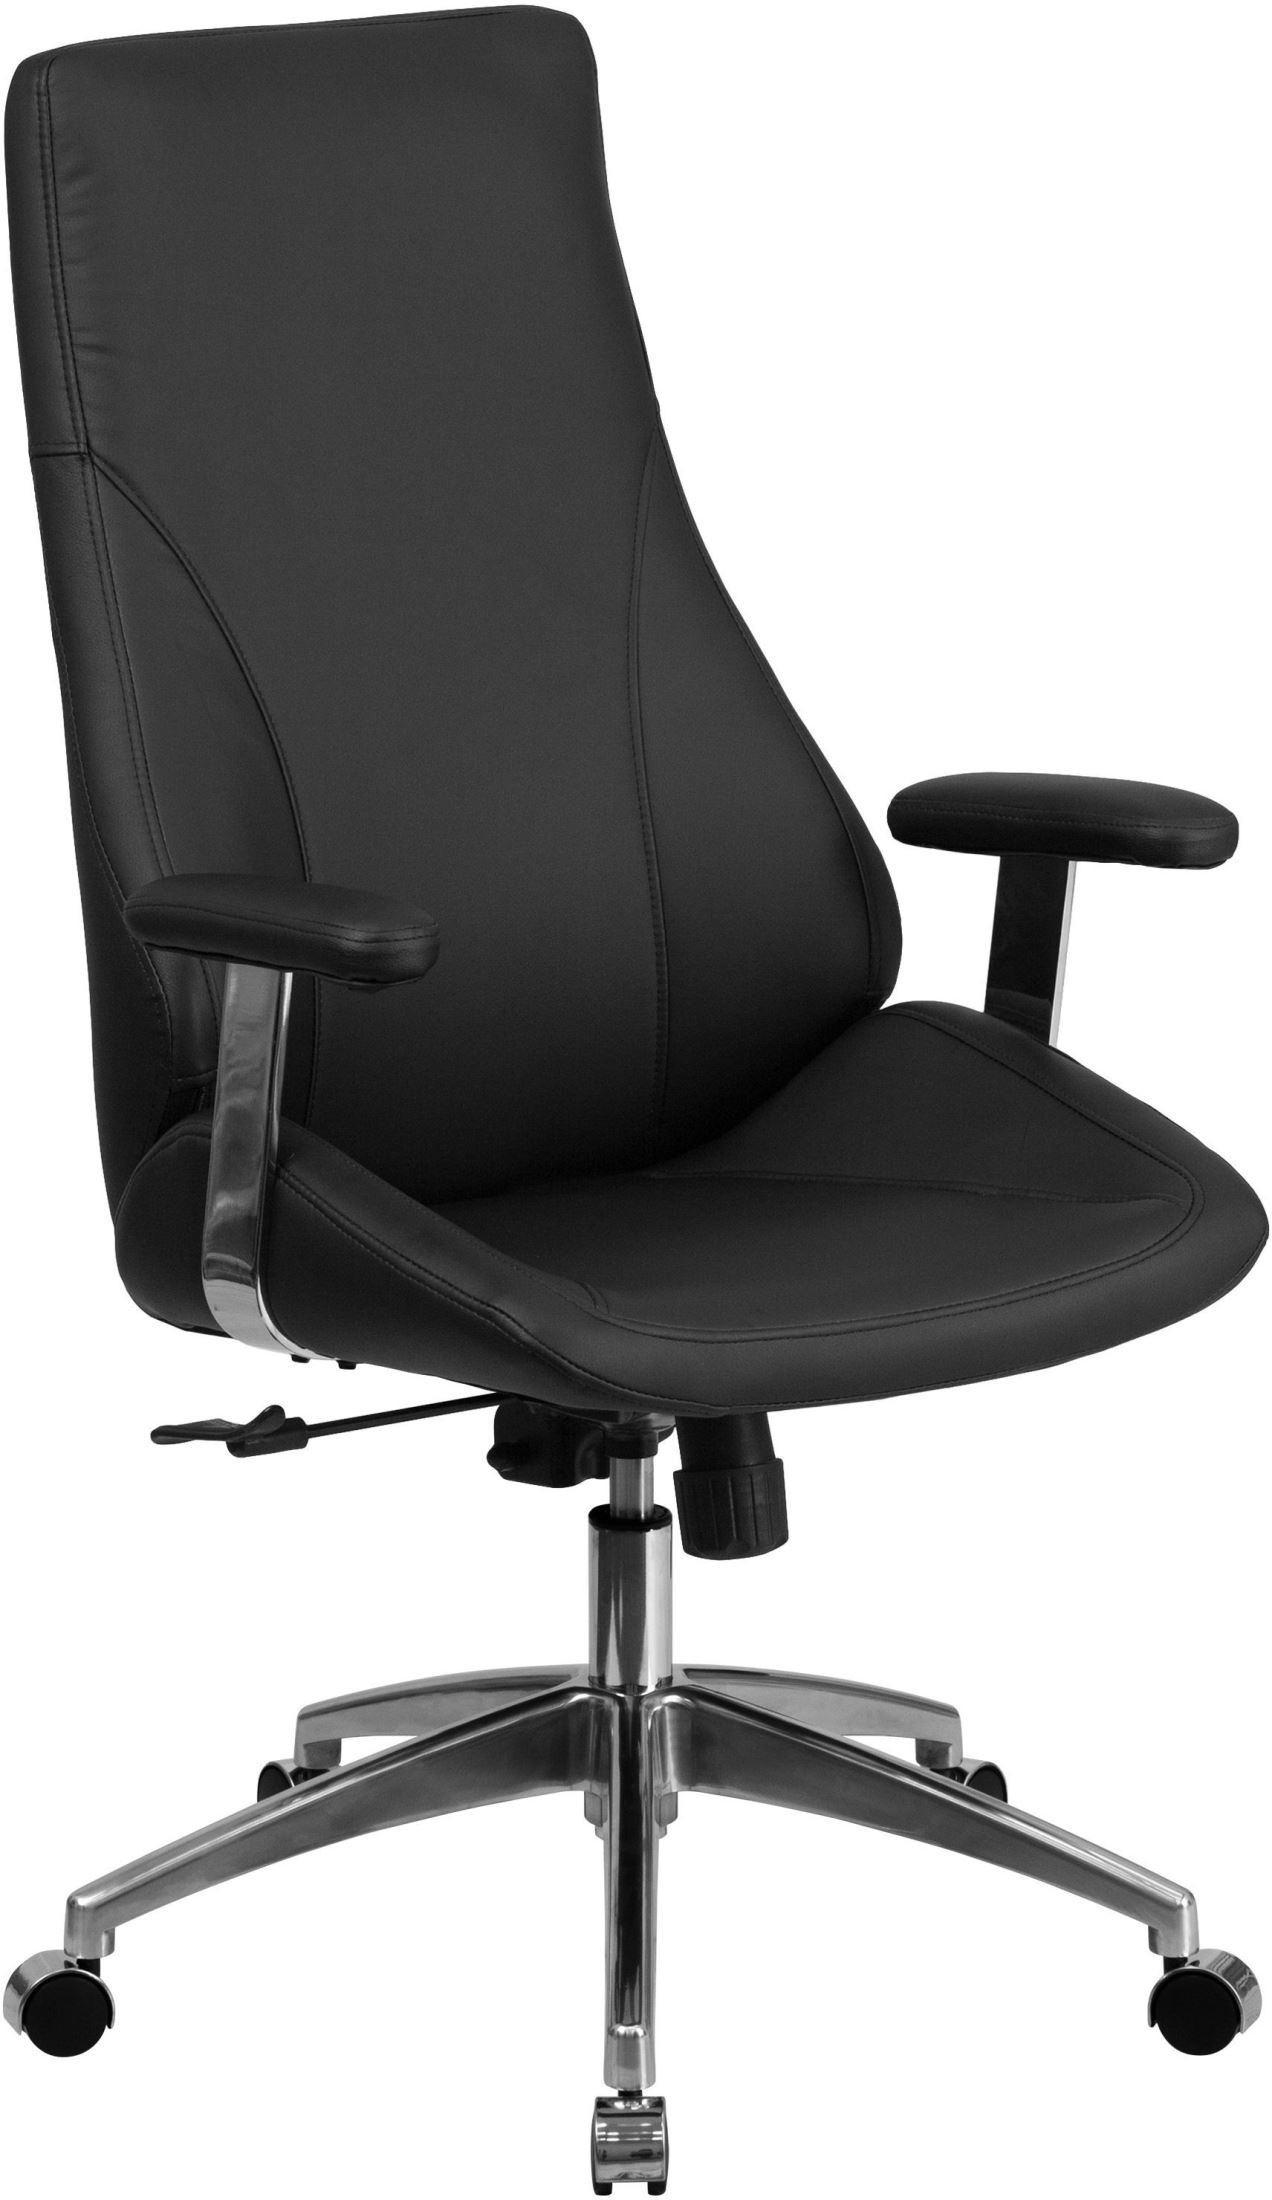 tall swivel chair cover hire blacktown black executive office bt 90068h gg